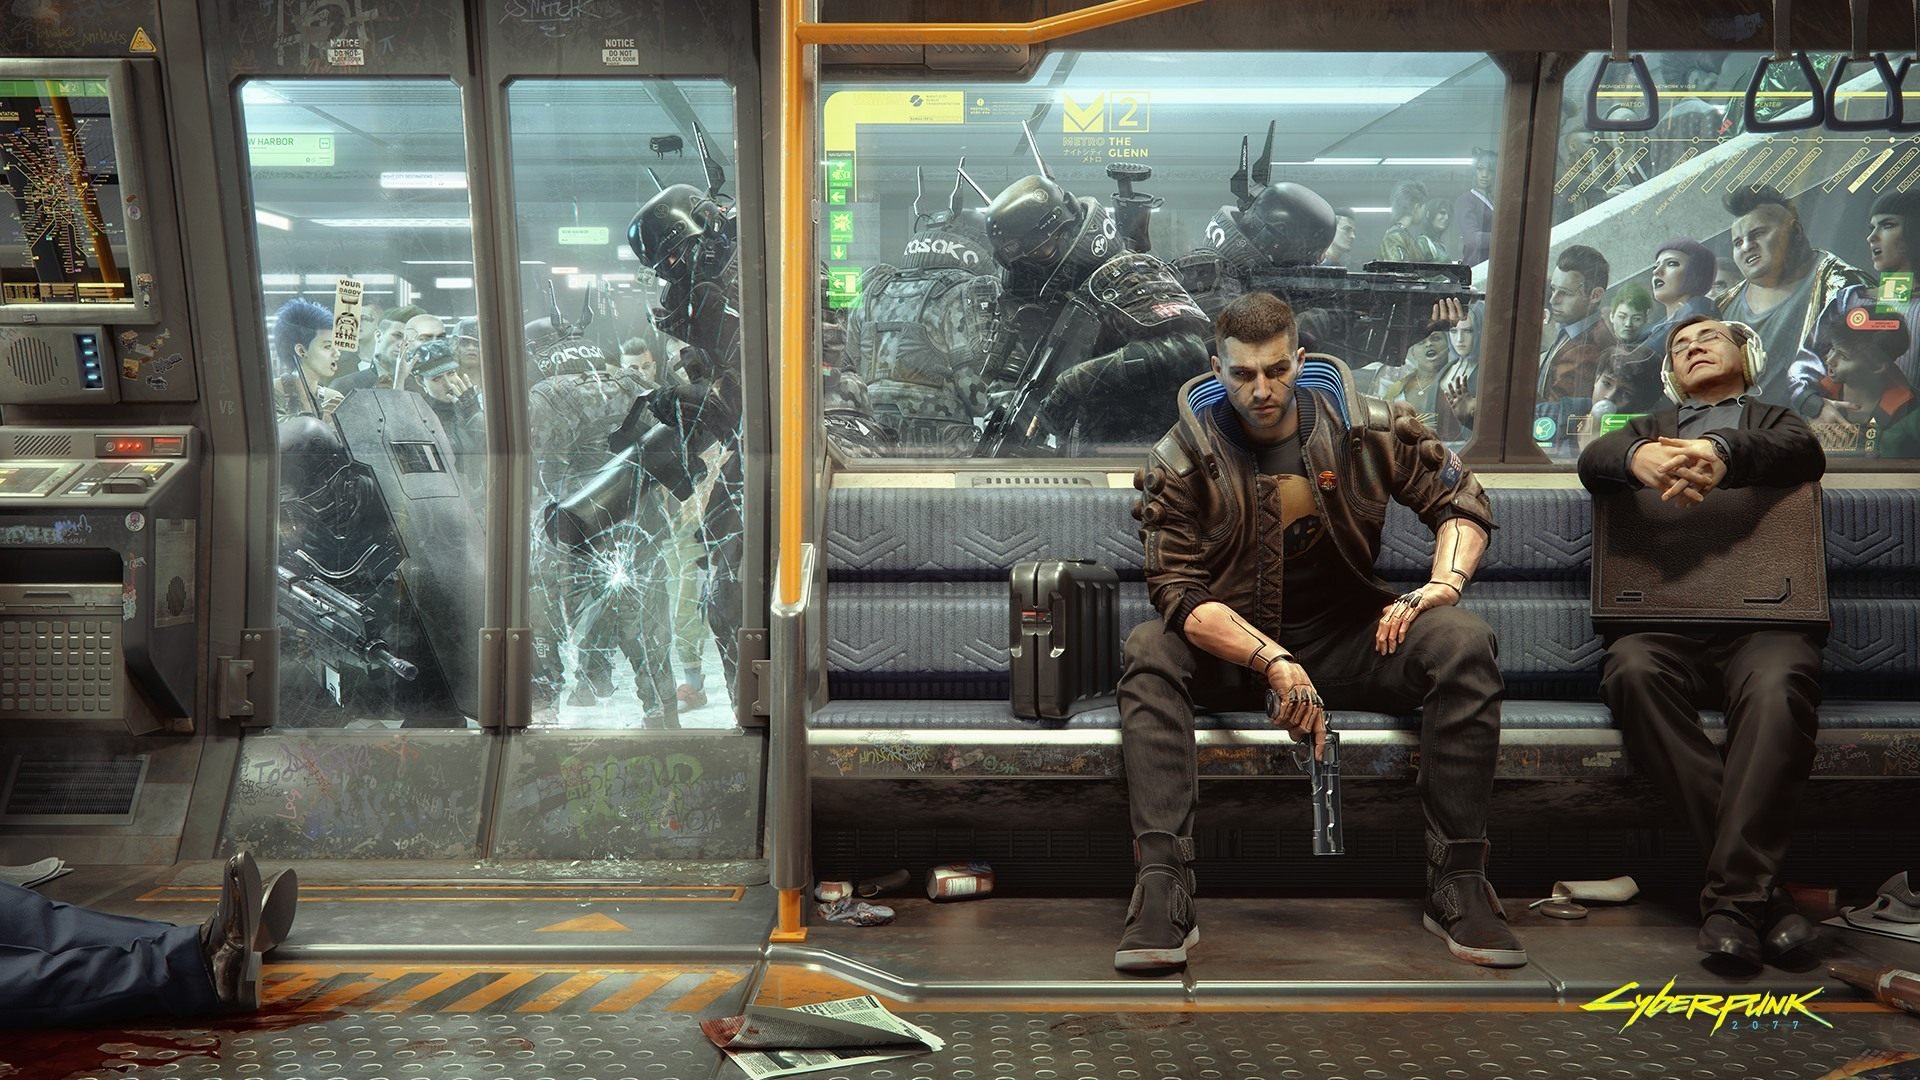 Cyberpunk 2077 แจกวอลเปเปอร์จากเกมให้เลือก 4 แบบ - GameFever